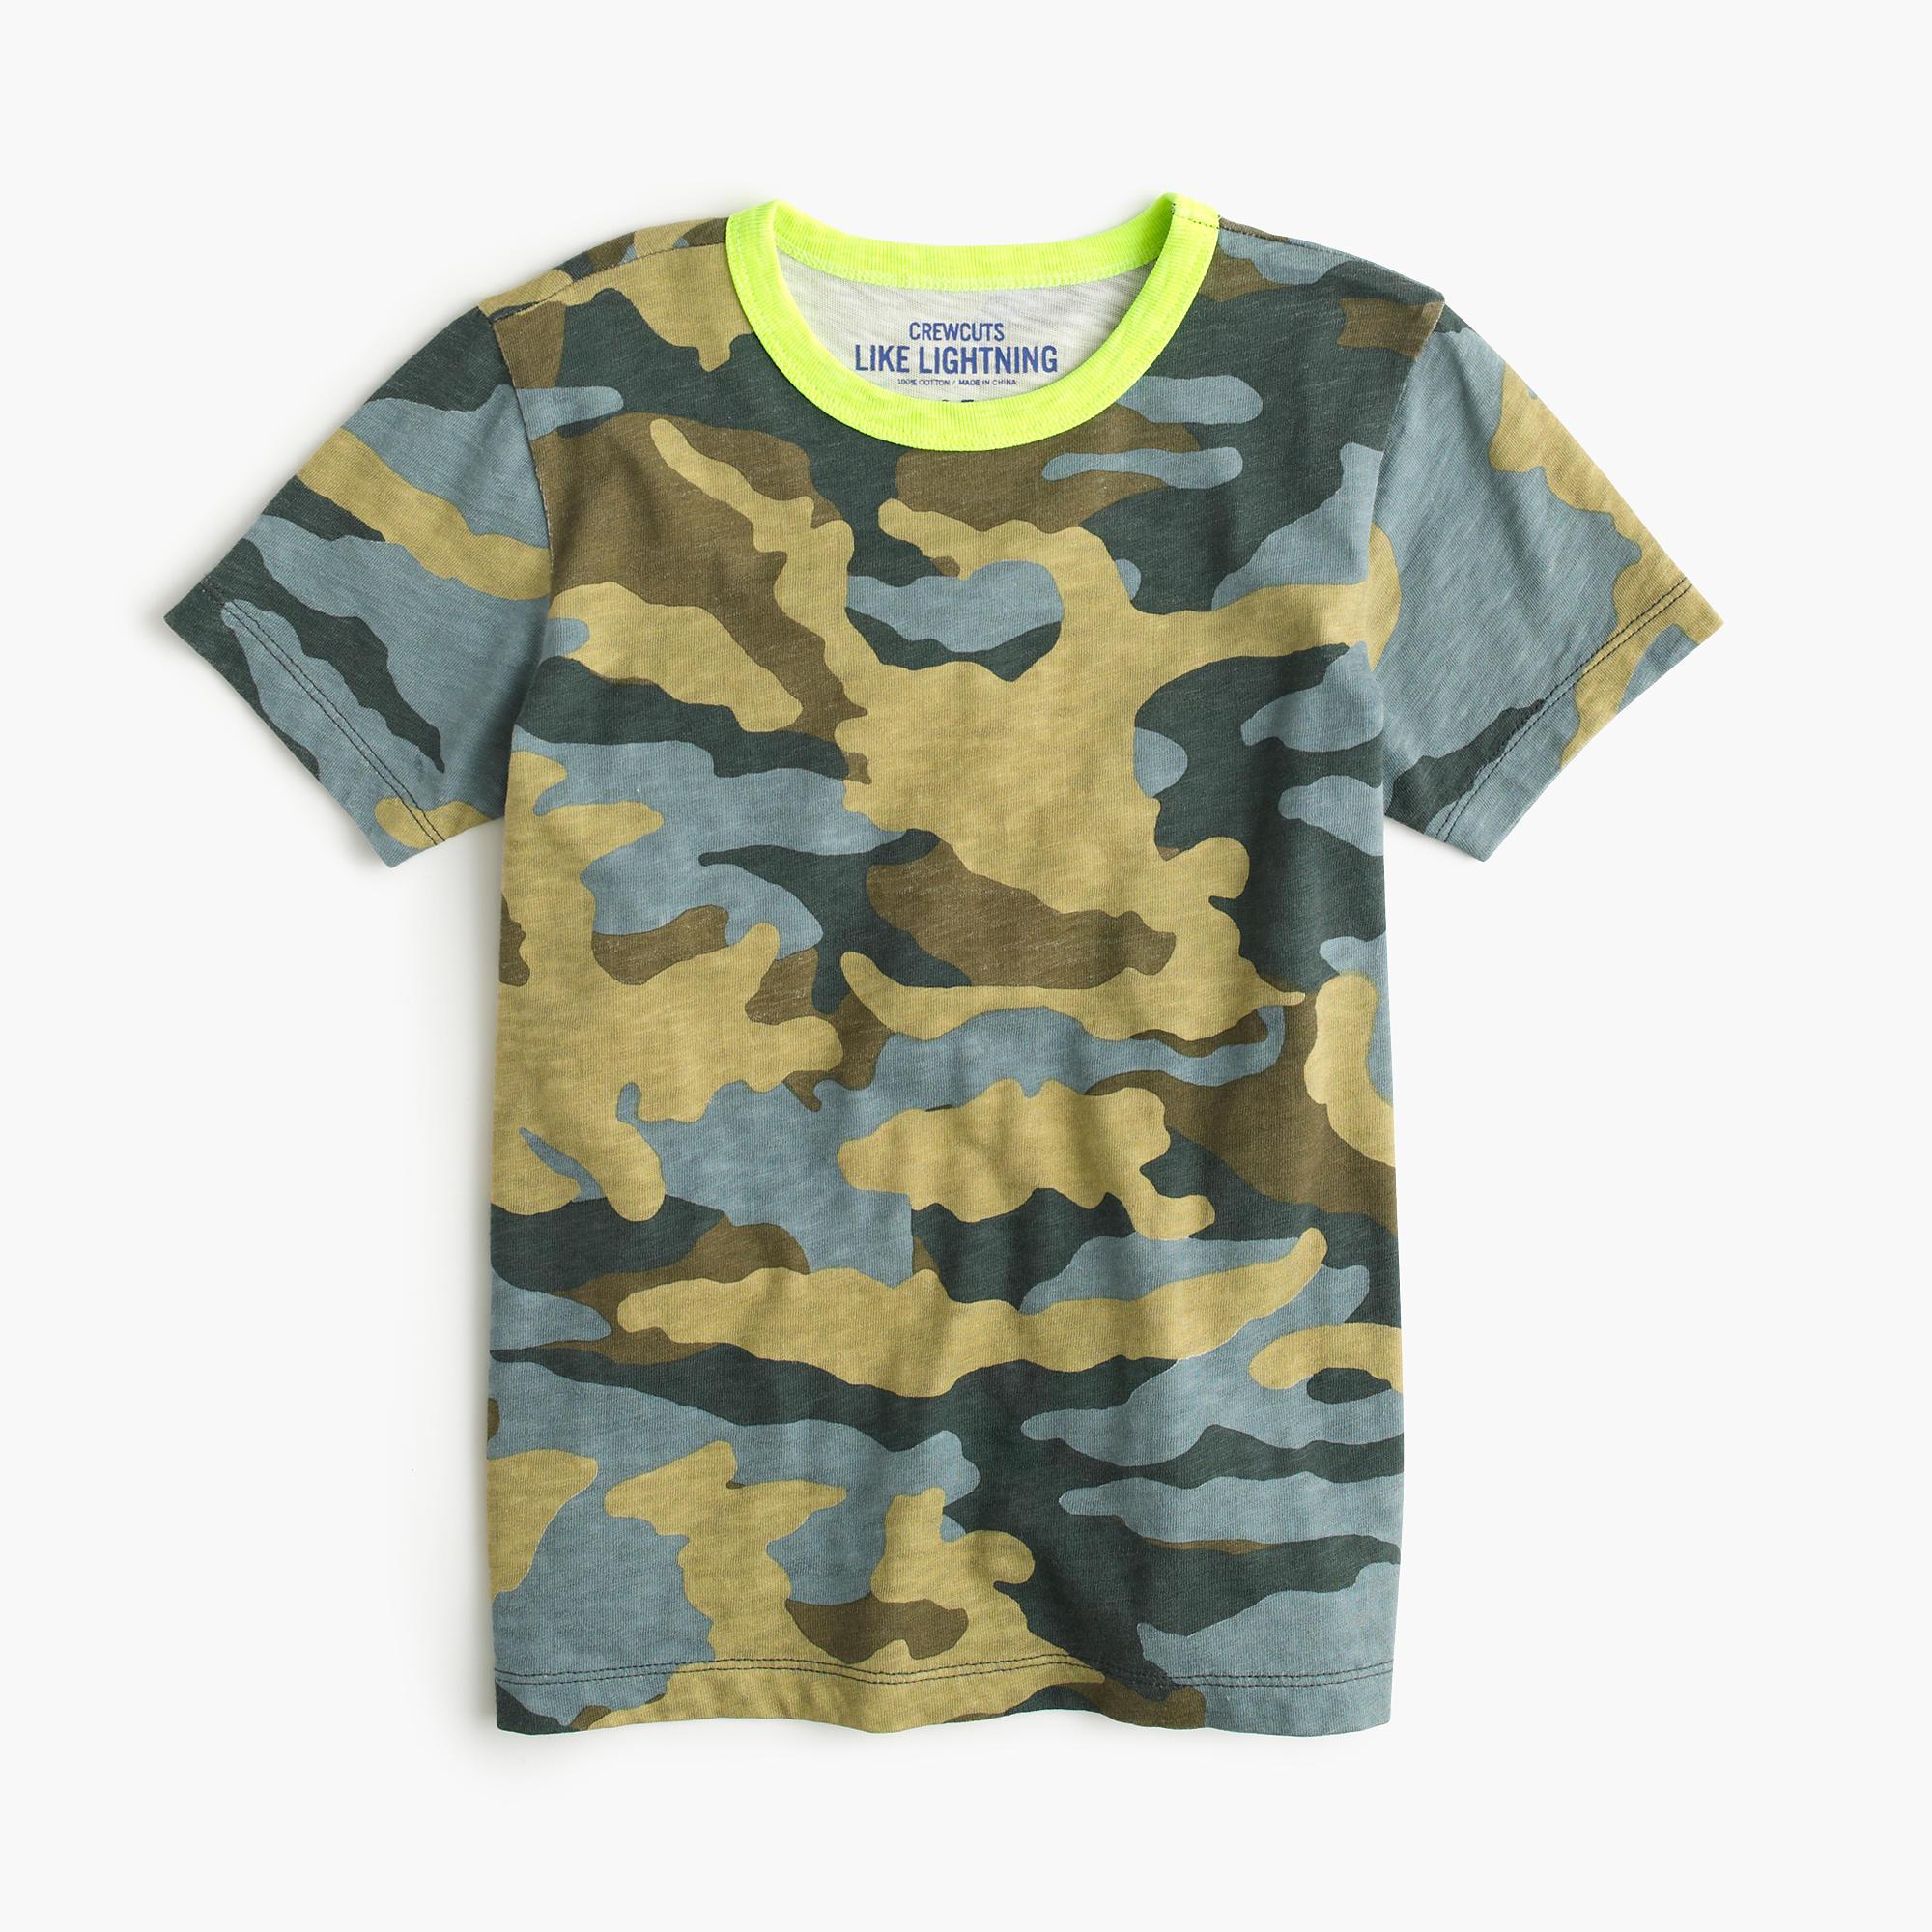 J.Crew camo T-shirt $32.50